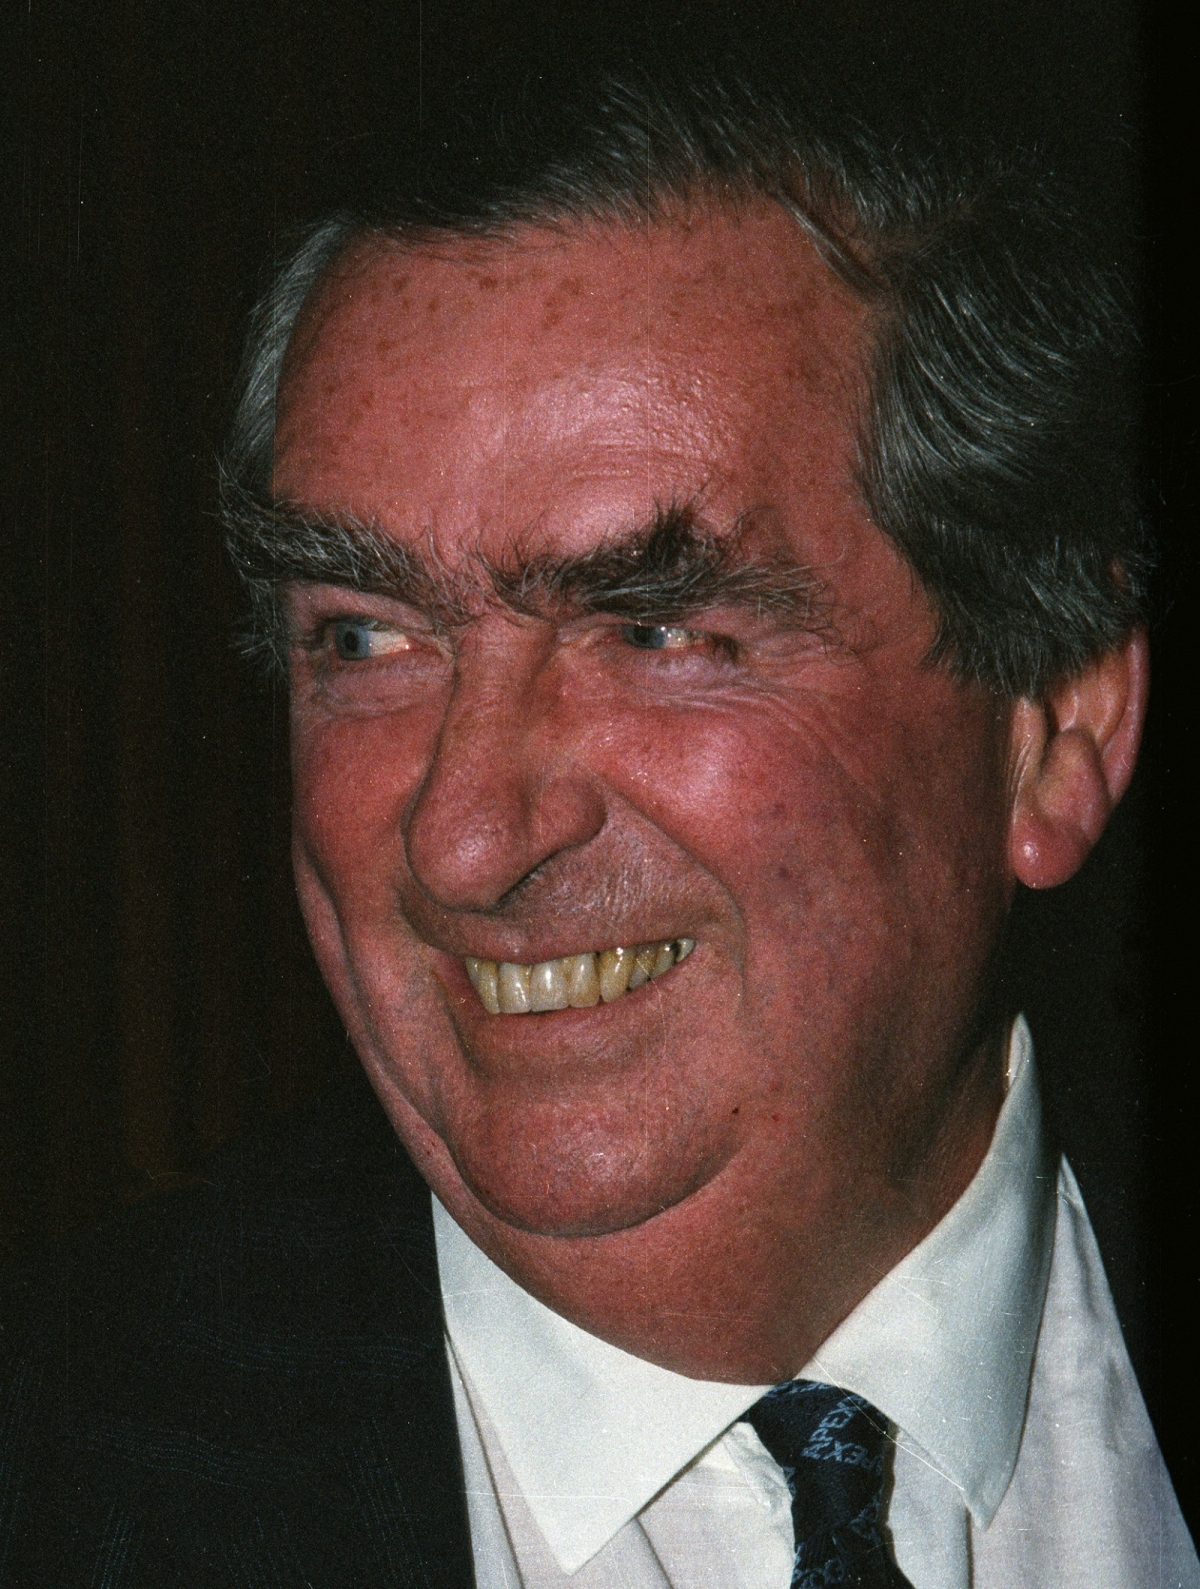 Denis Healey MP in 1986